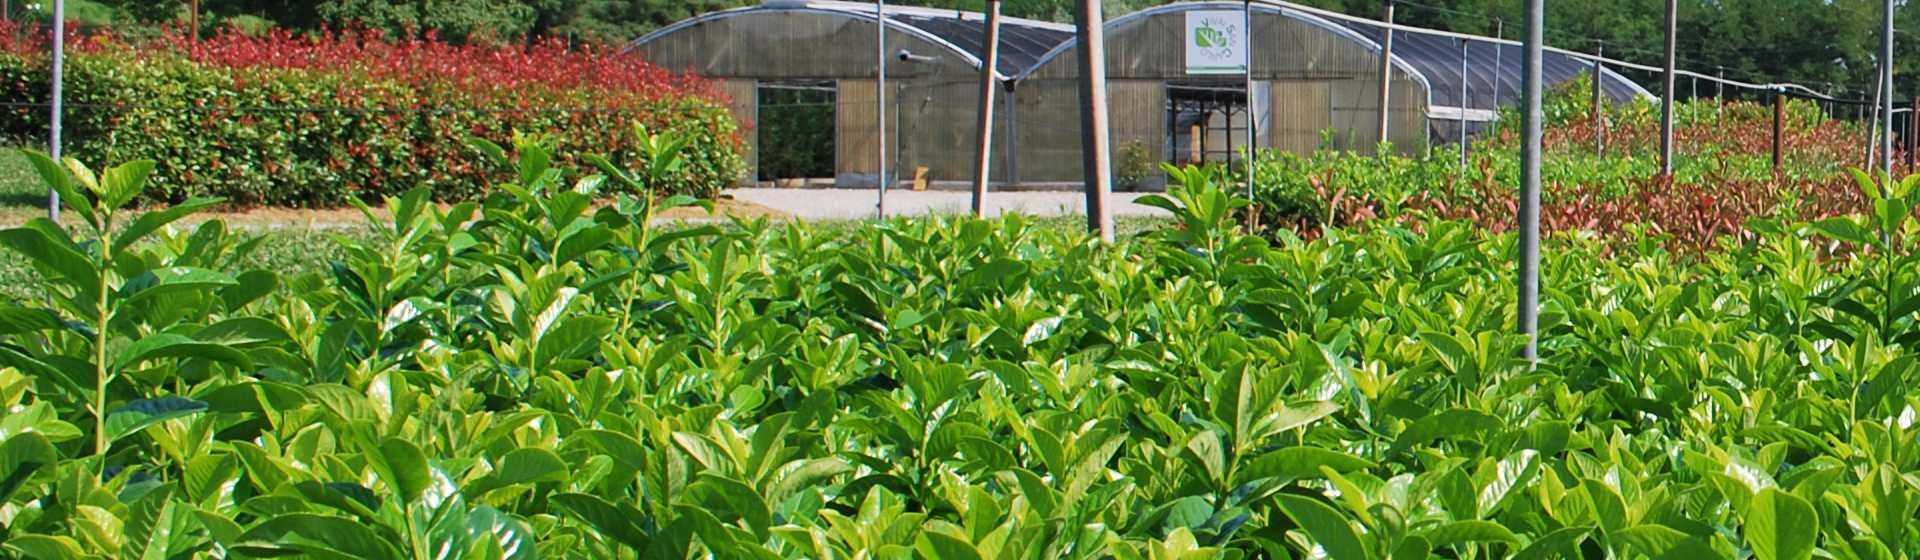 Vivaio piante da siepe produzione piante da siepe - Piante siepe ...